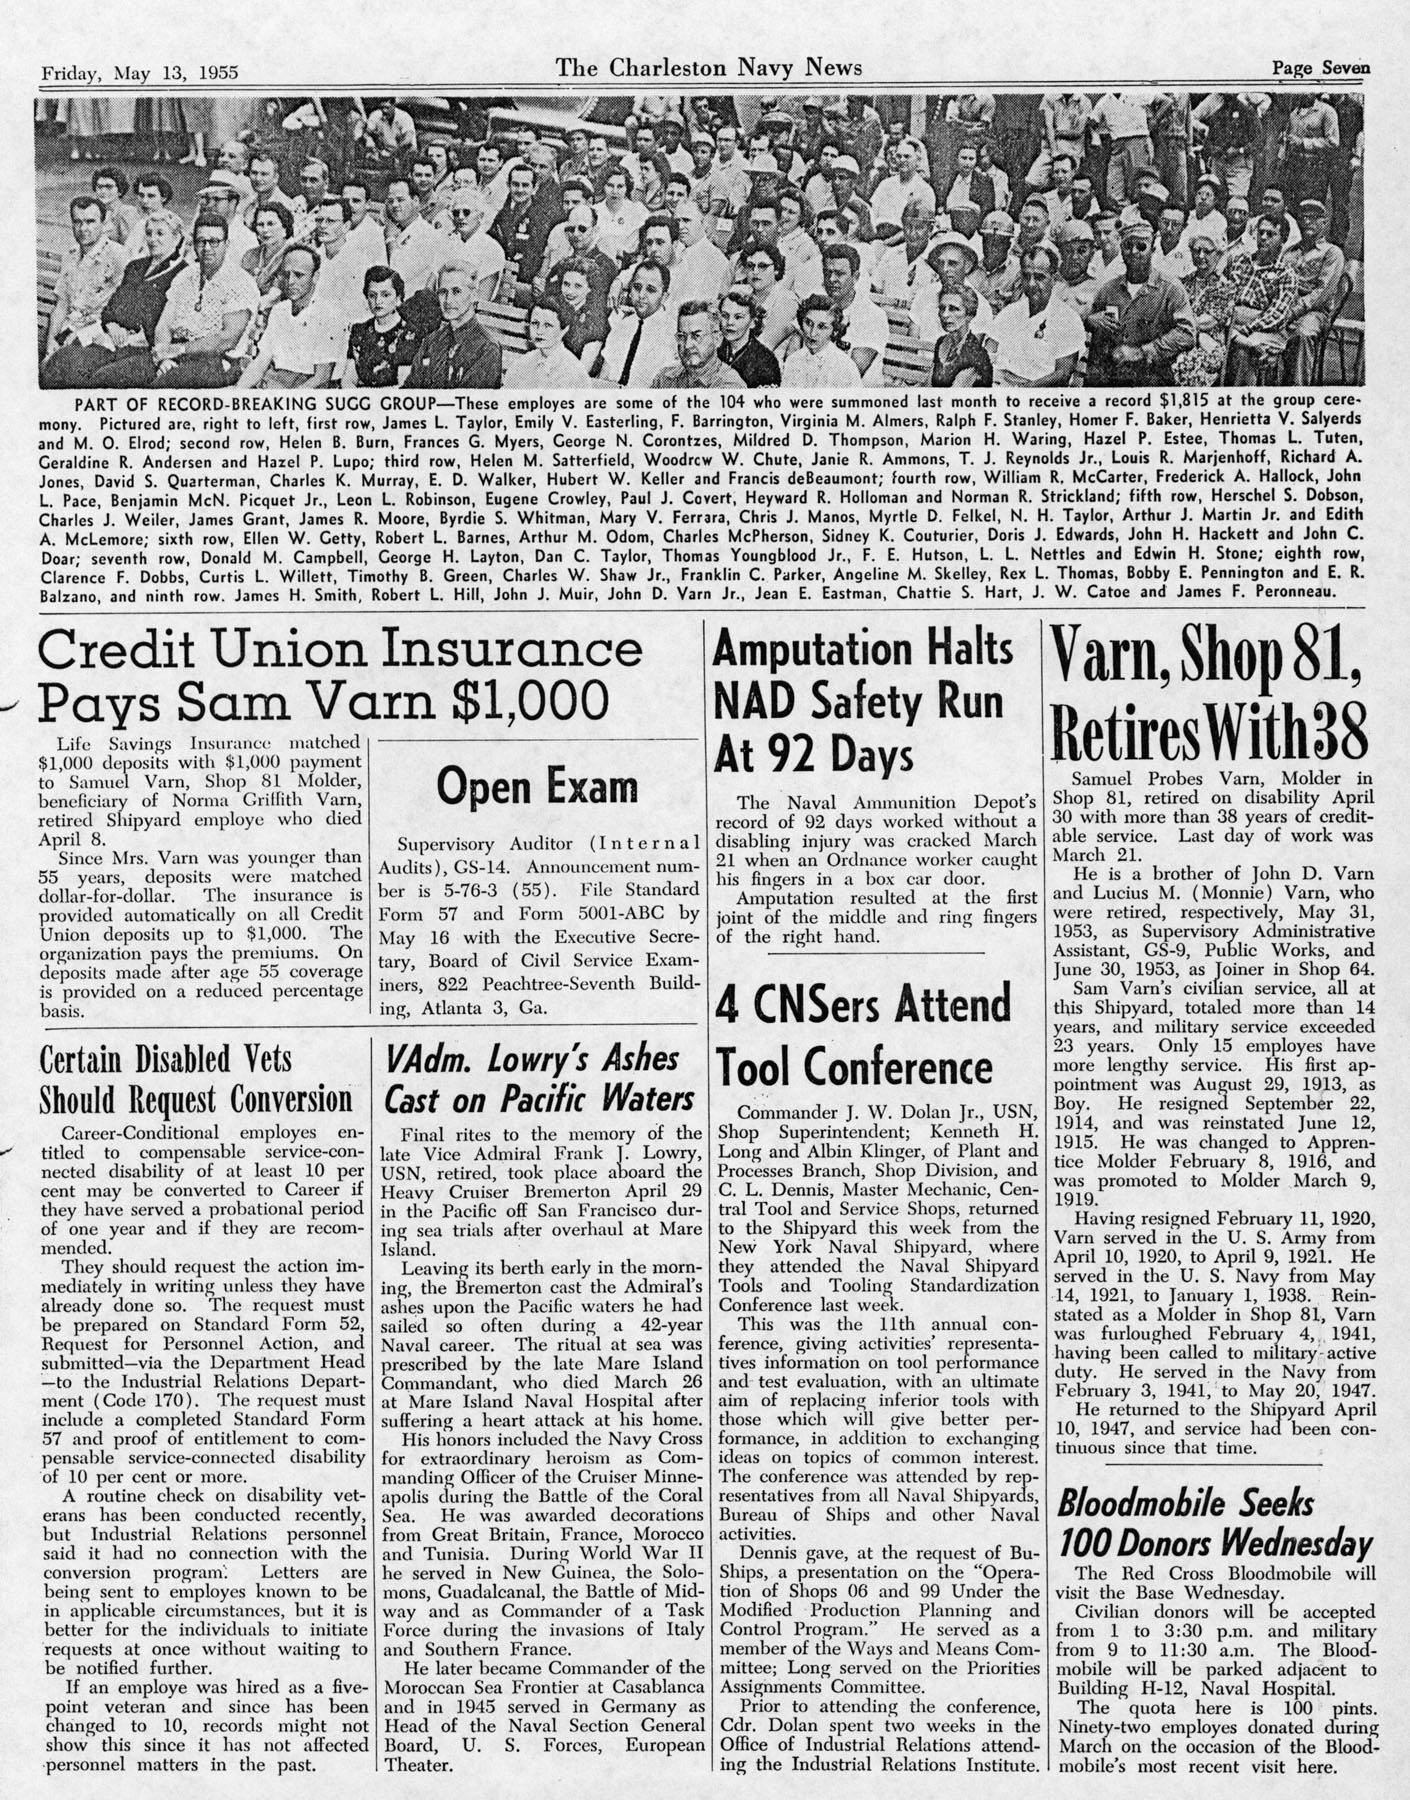 The Charleston Navy News, Volume 13, Edition 22, page vii